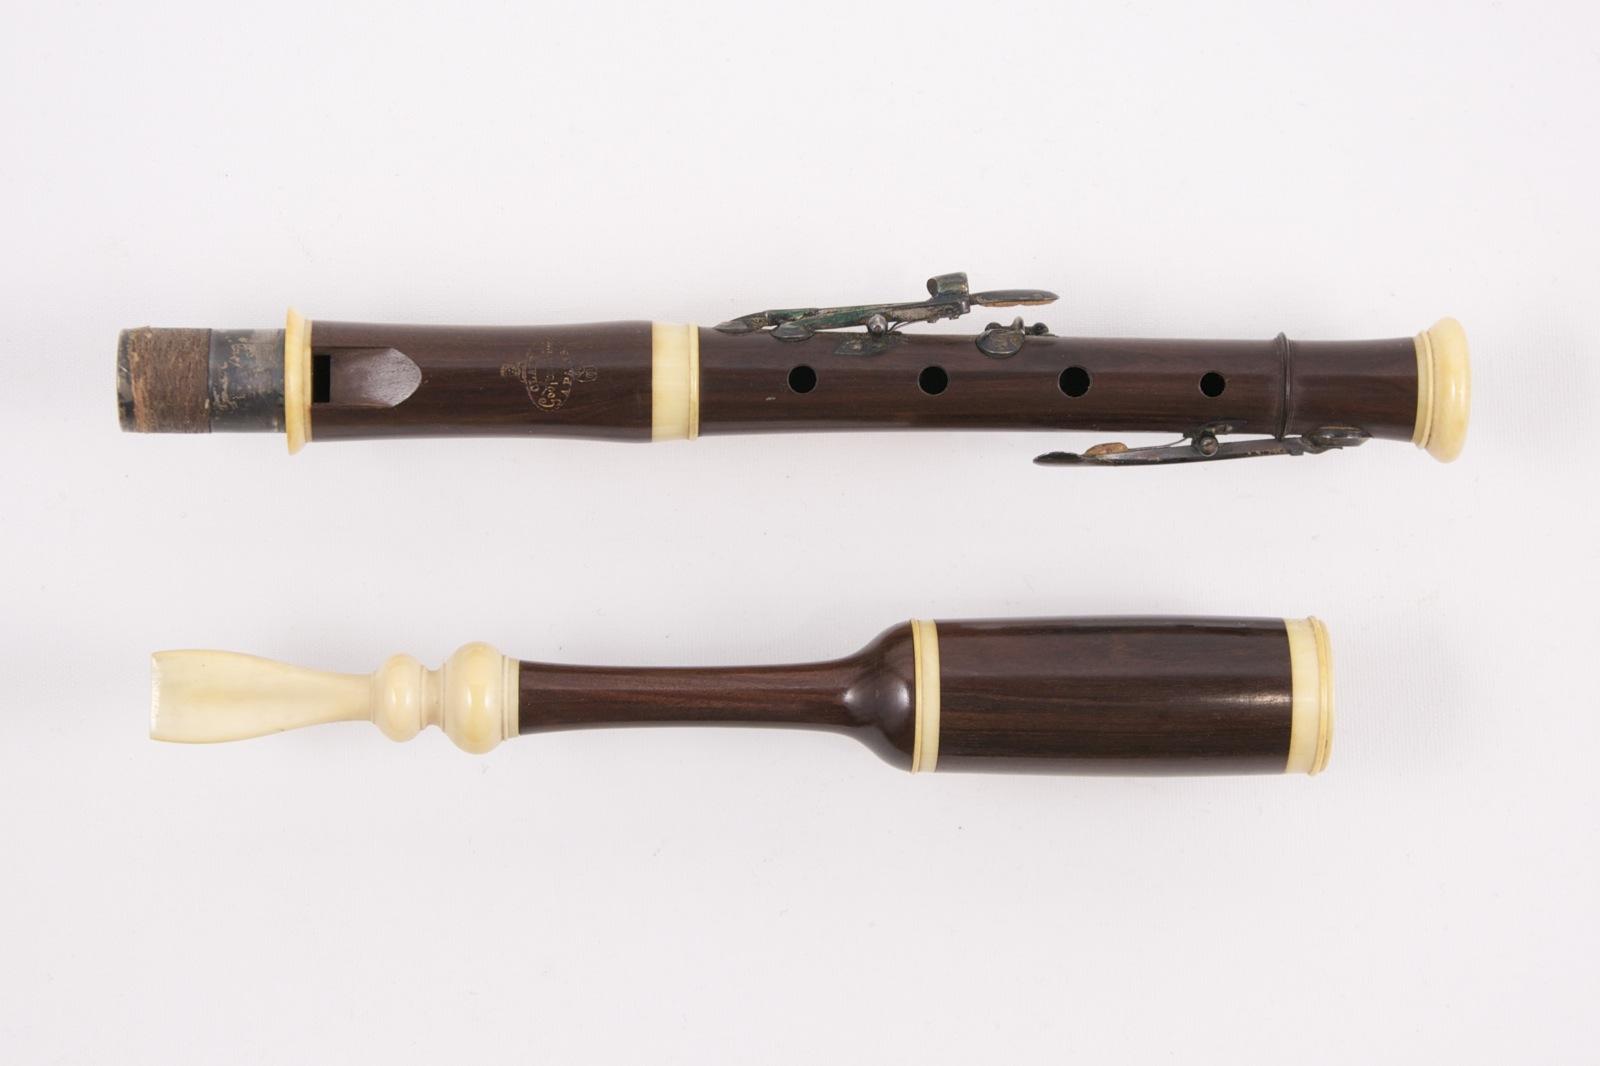 1811-flageolet-Clair-Godfroy-Aine-13